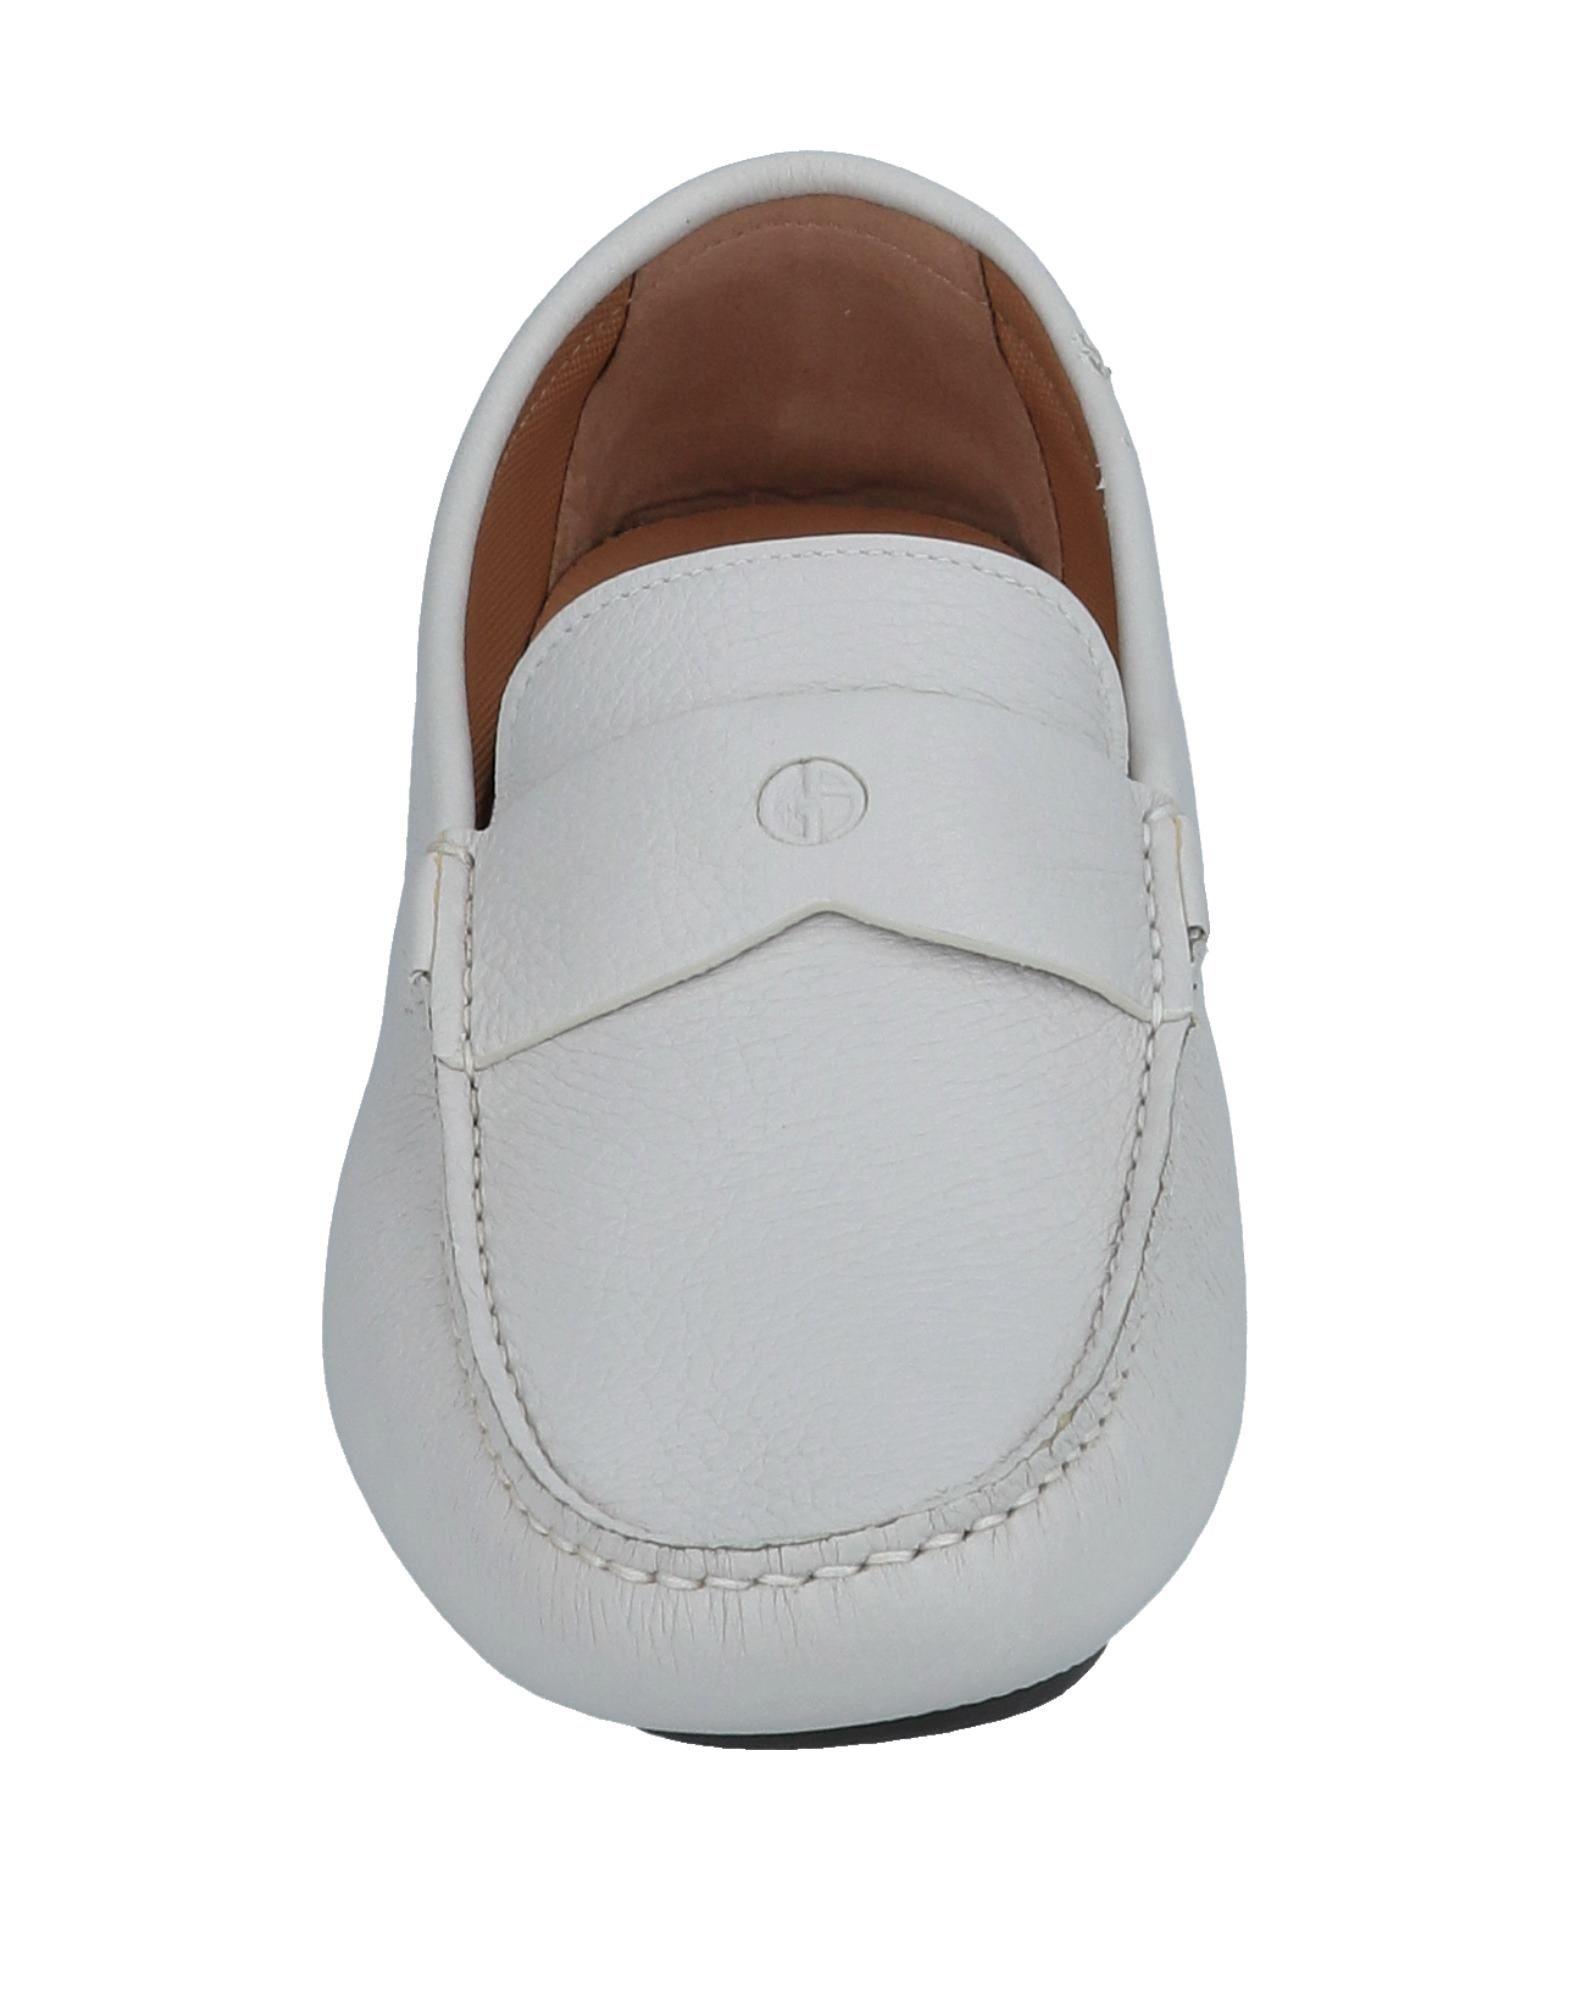 Giorgio Armani Mokassins Qualität Herren  11555582EU Gute Qualität Mokassins beliebte Schuhe abf84a